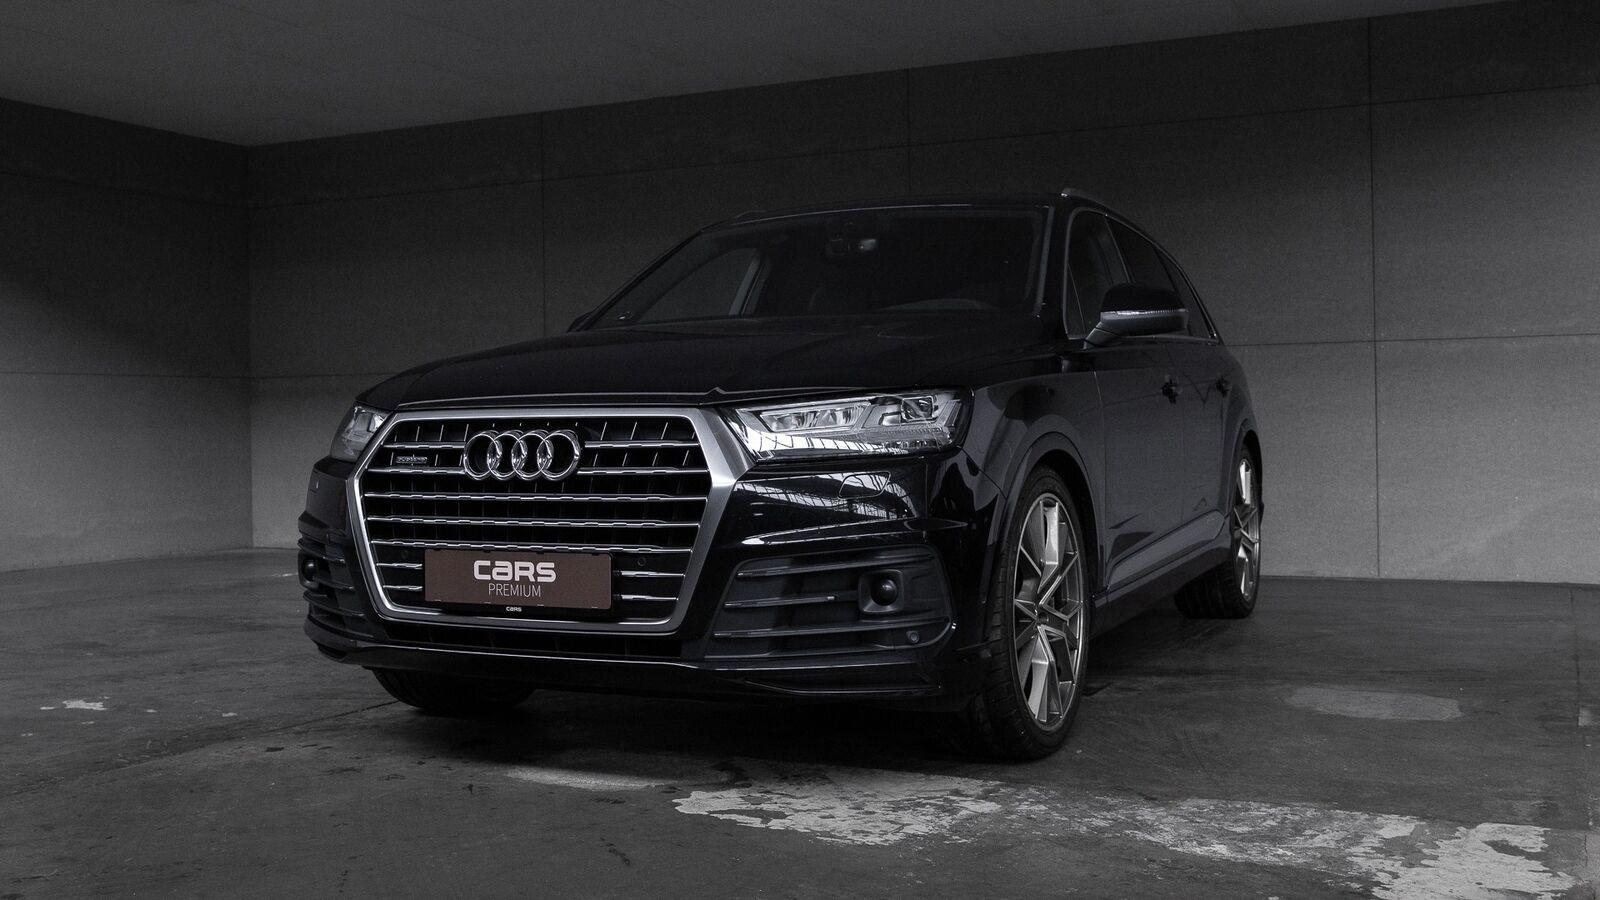 Audi Q7 3,0 TDi 272 S-line quat. Tiptr. 7p 5d - 4.450 kr.